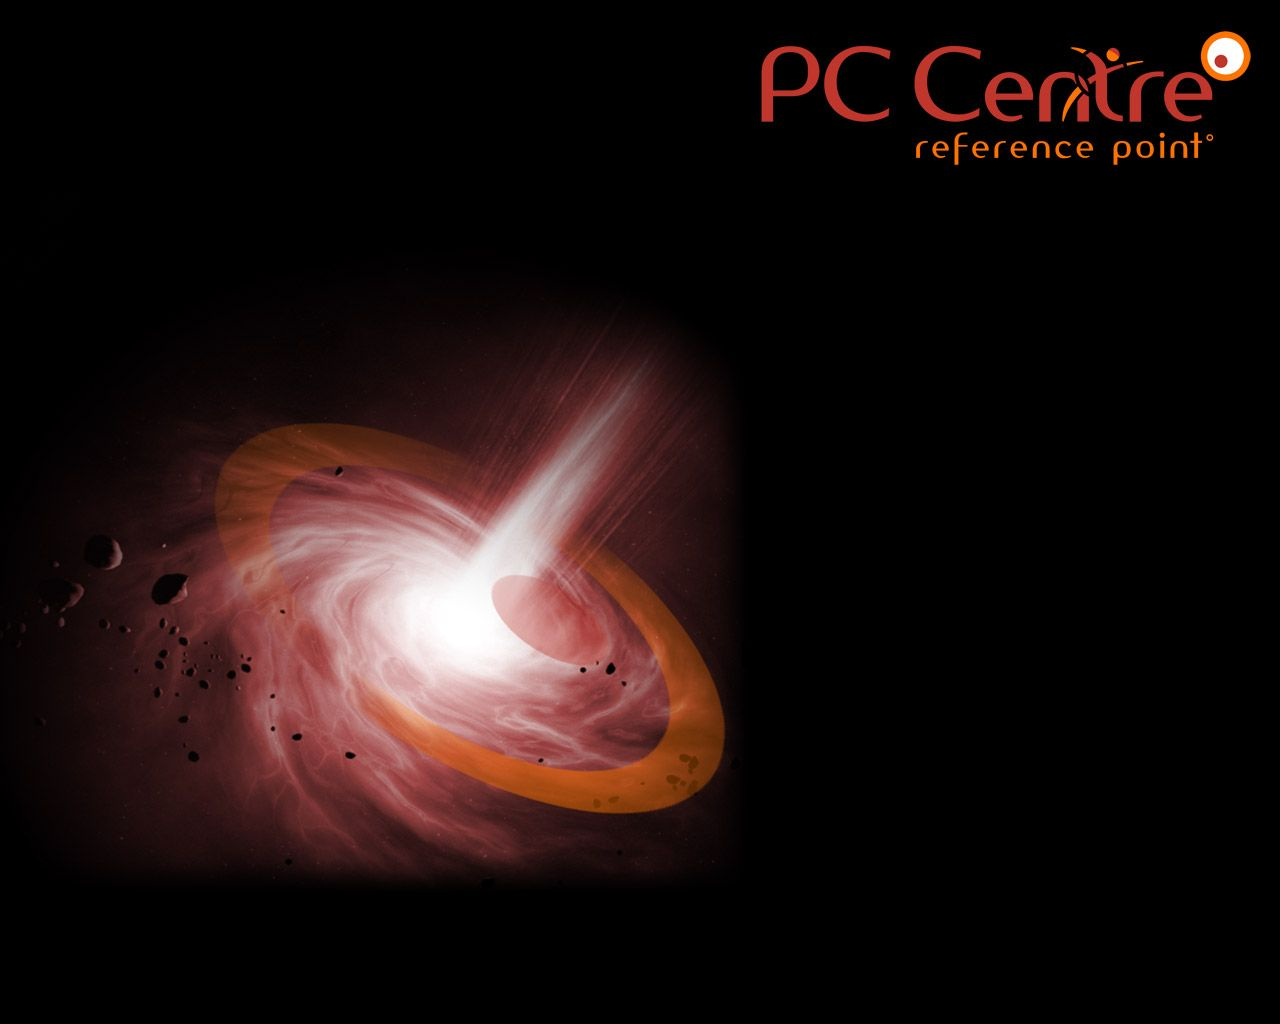 Galaktyka PC Centre